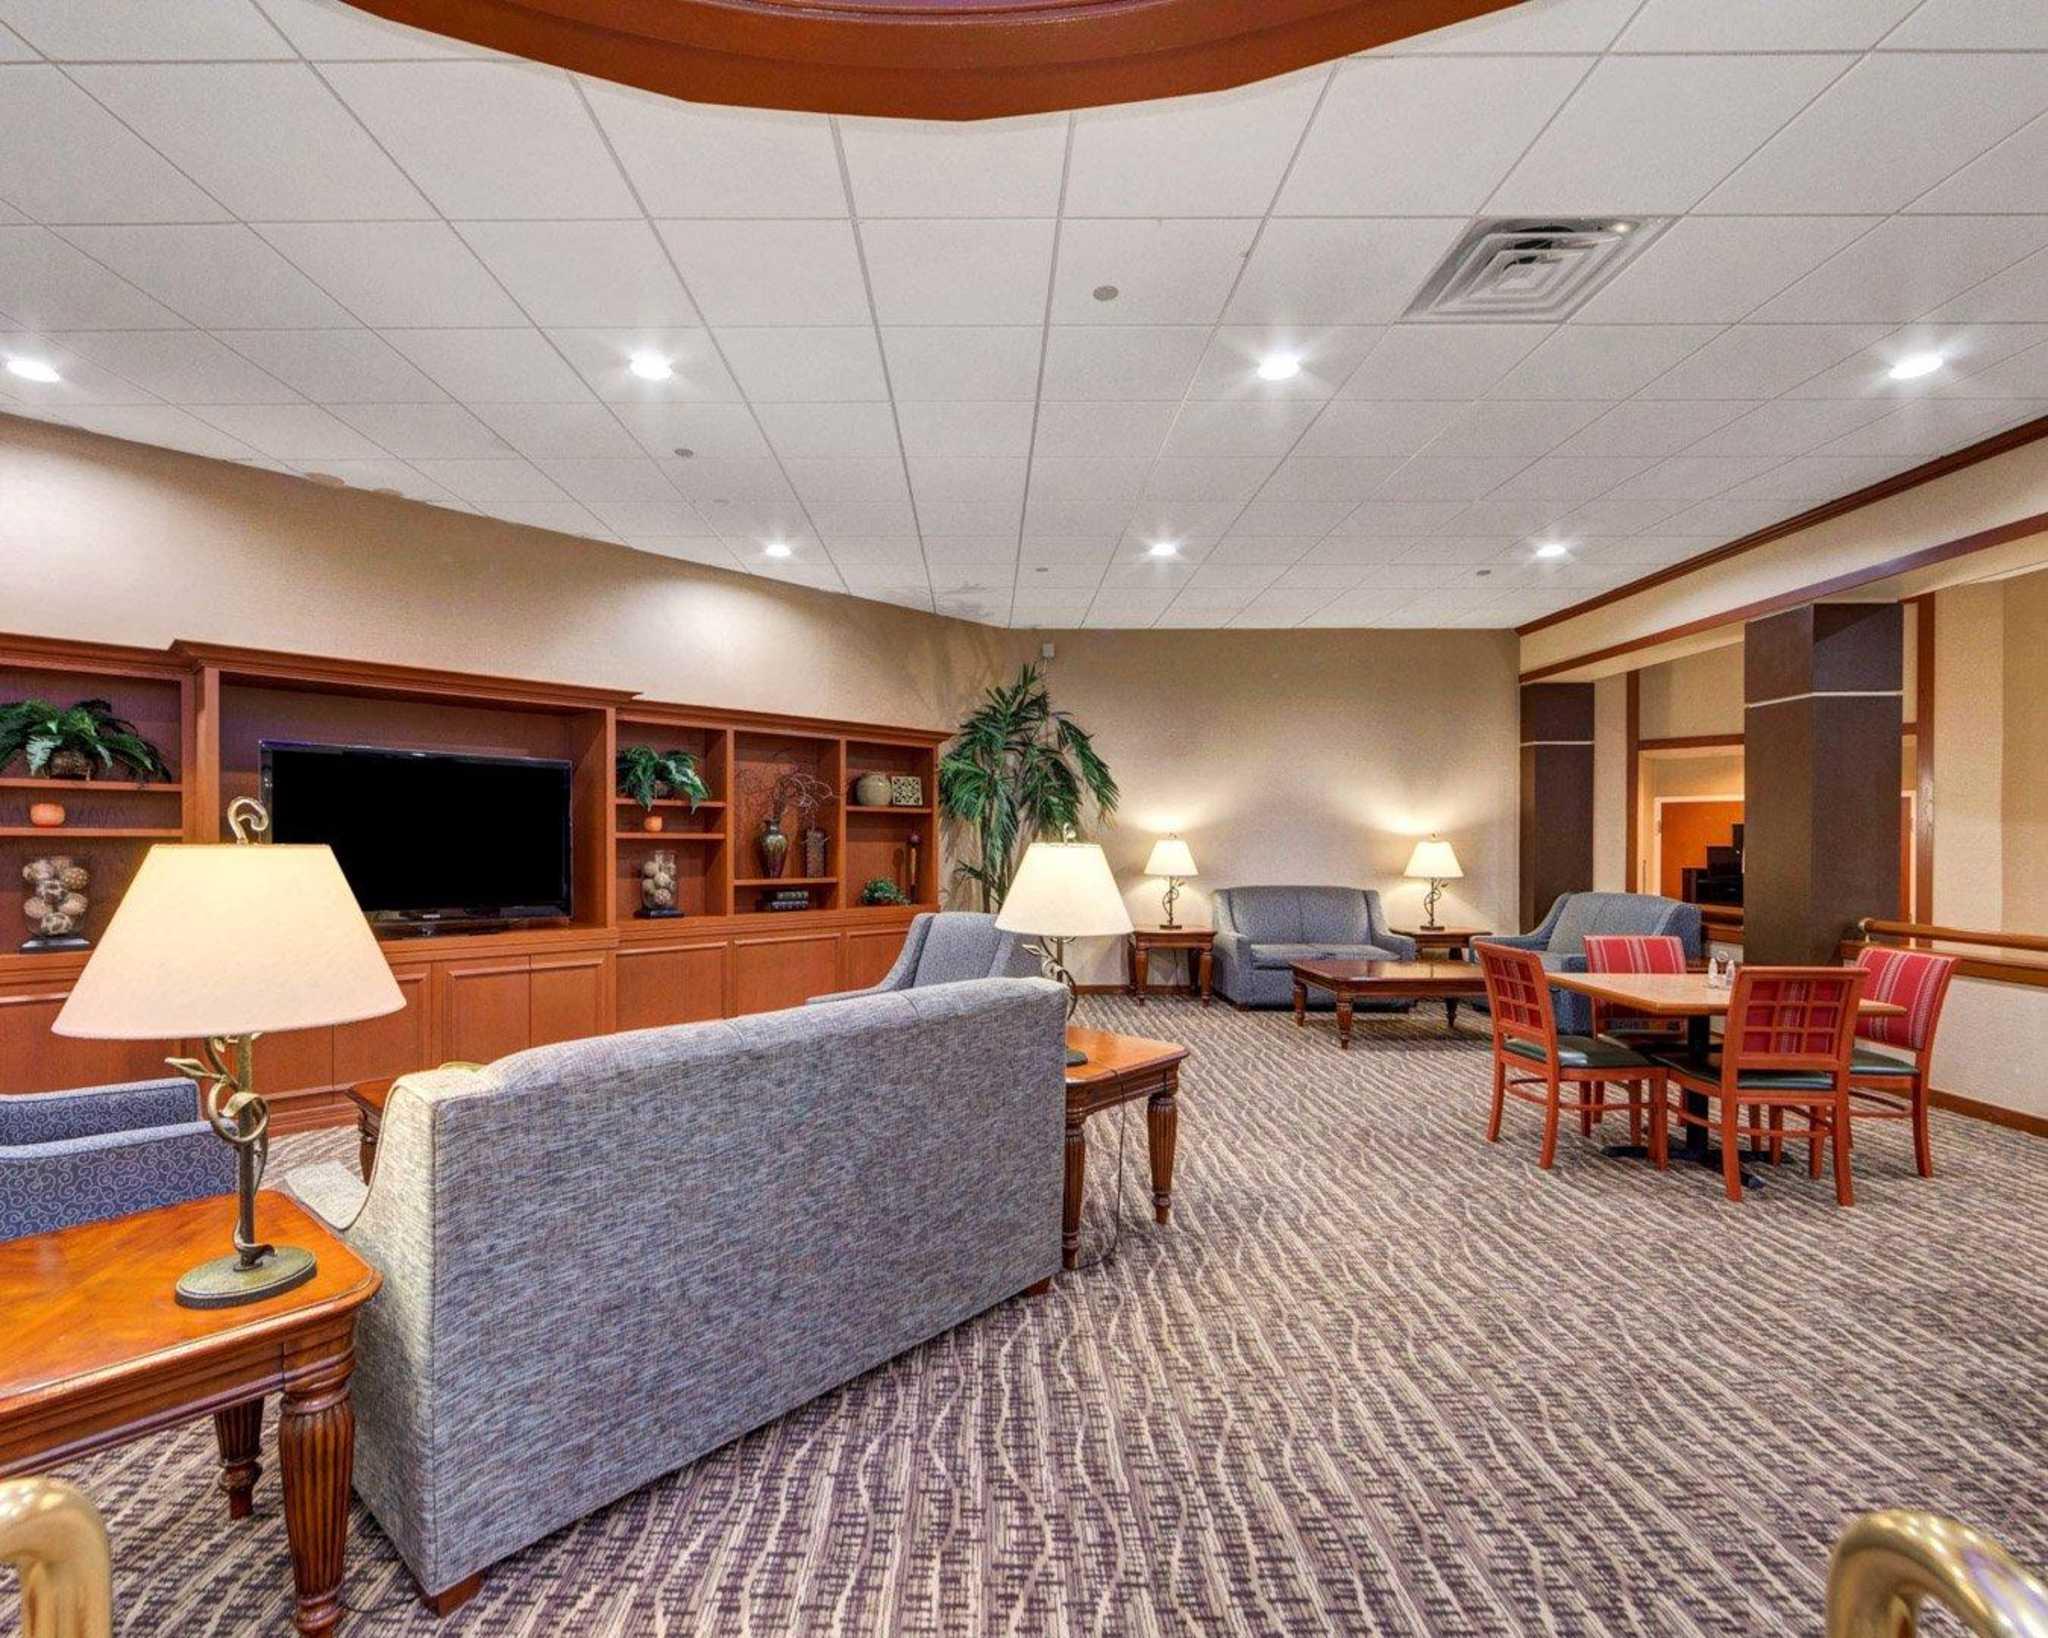 Comfort Inn & Suites Plano East image 17